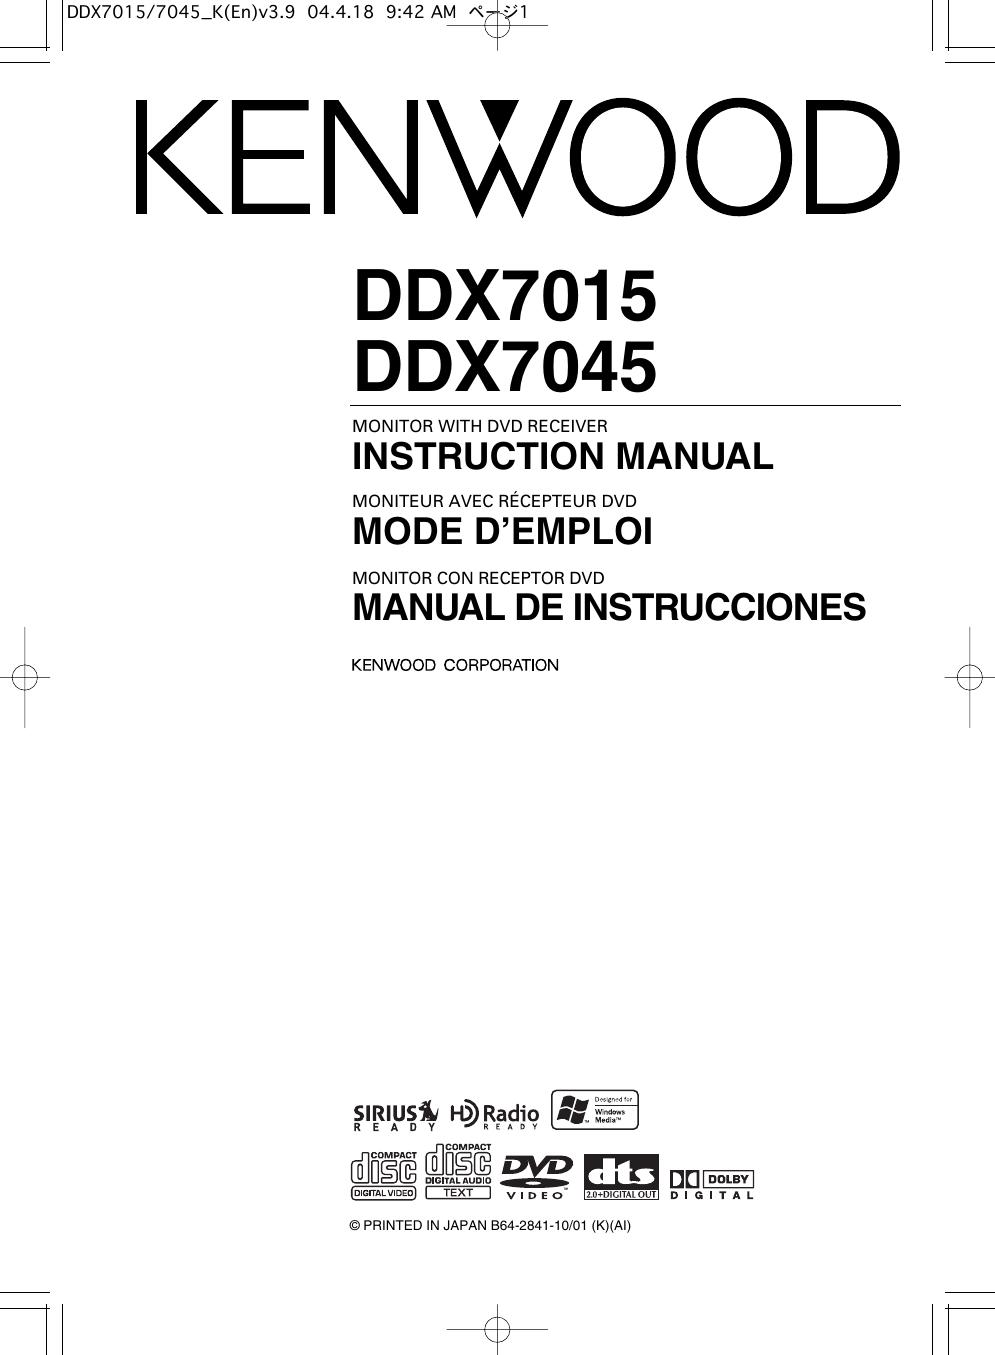 [DIAGRAM_4PO]  Kenwood Excelon Ddx7015 Users Manual DDX7015_7045 (Revised) | Ddx7015 Wiring Diagram |  | UserManual.wiki